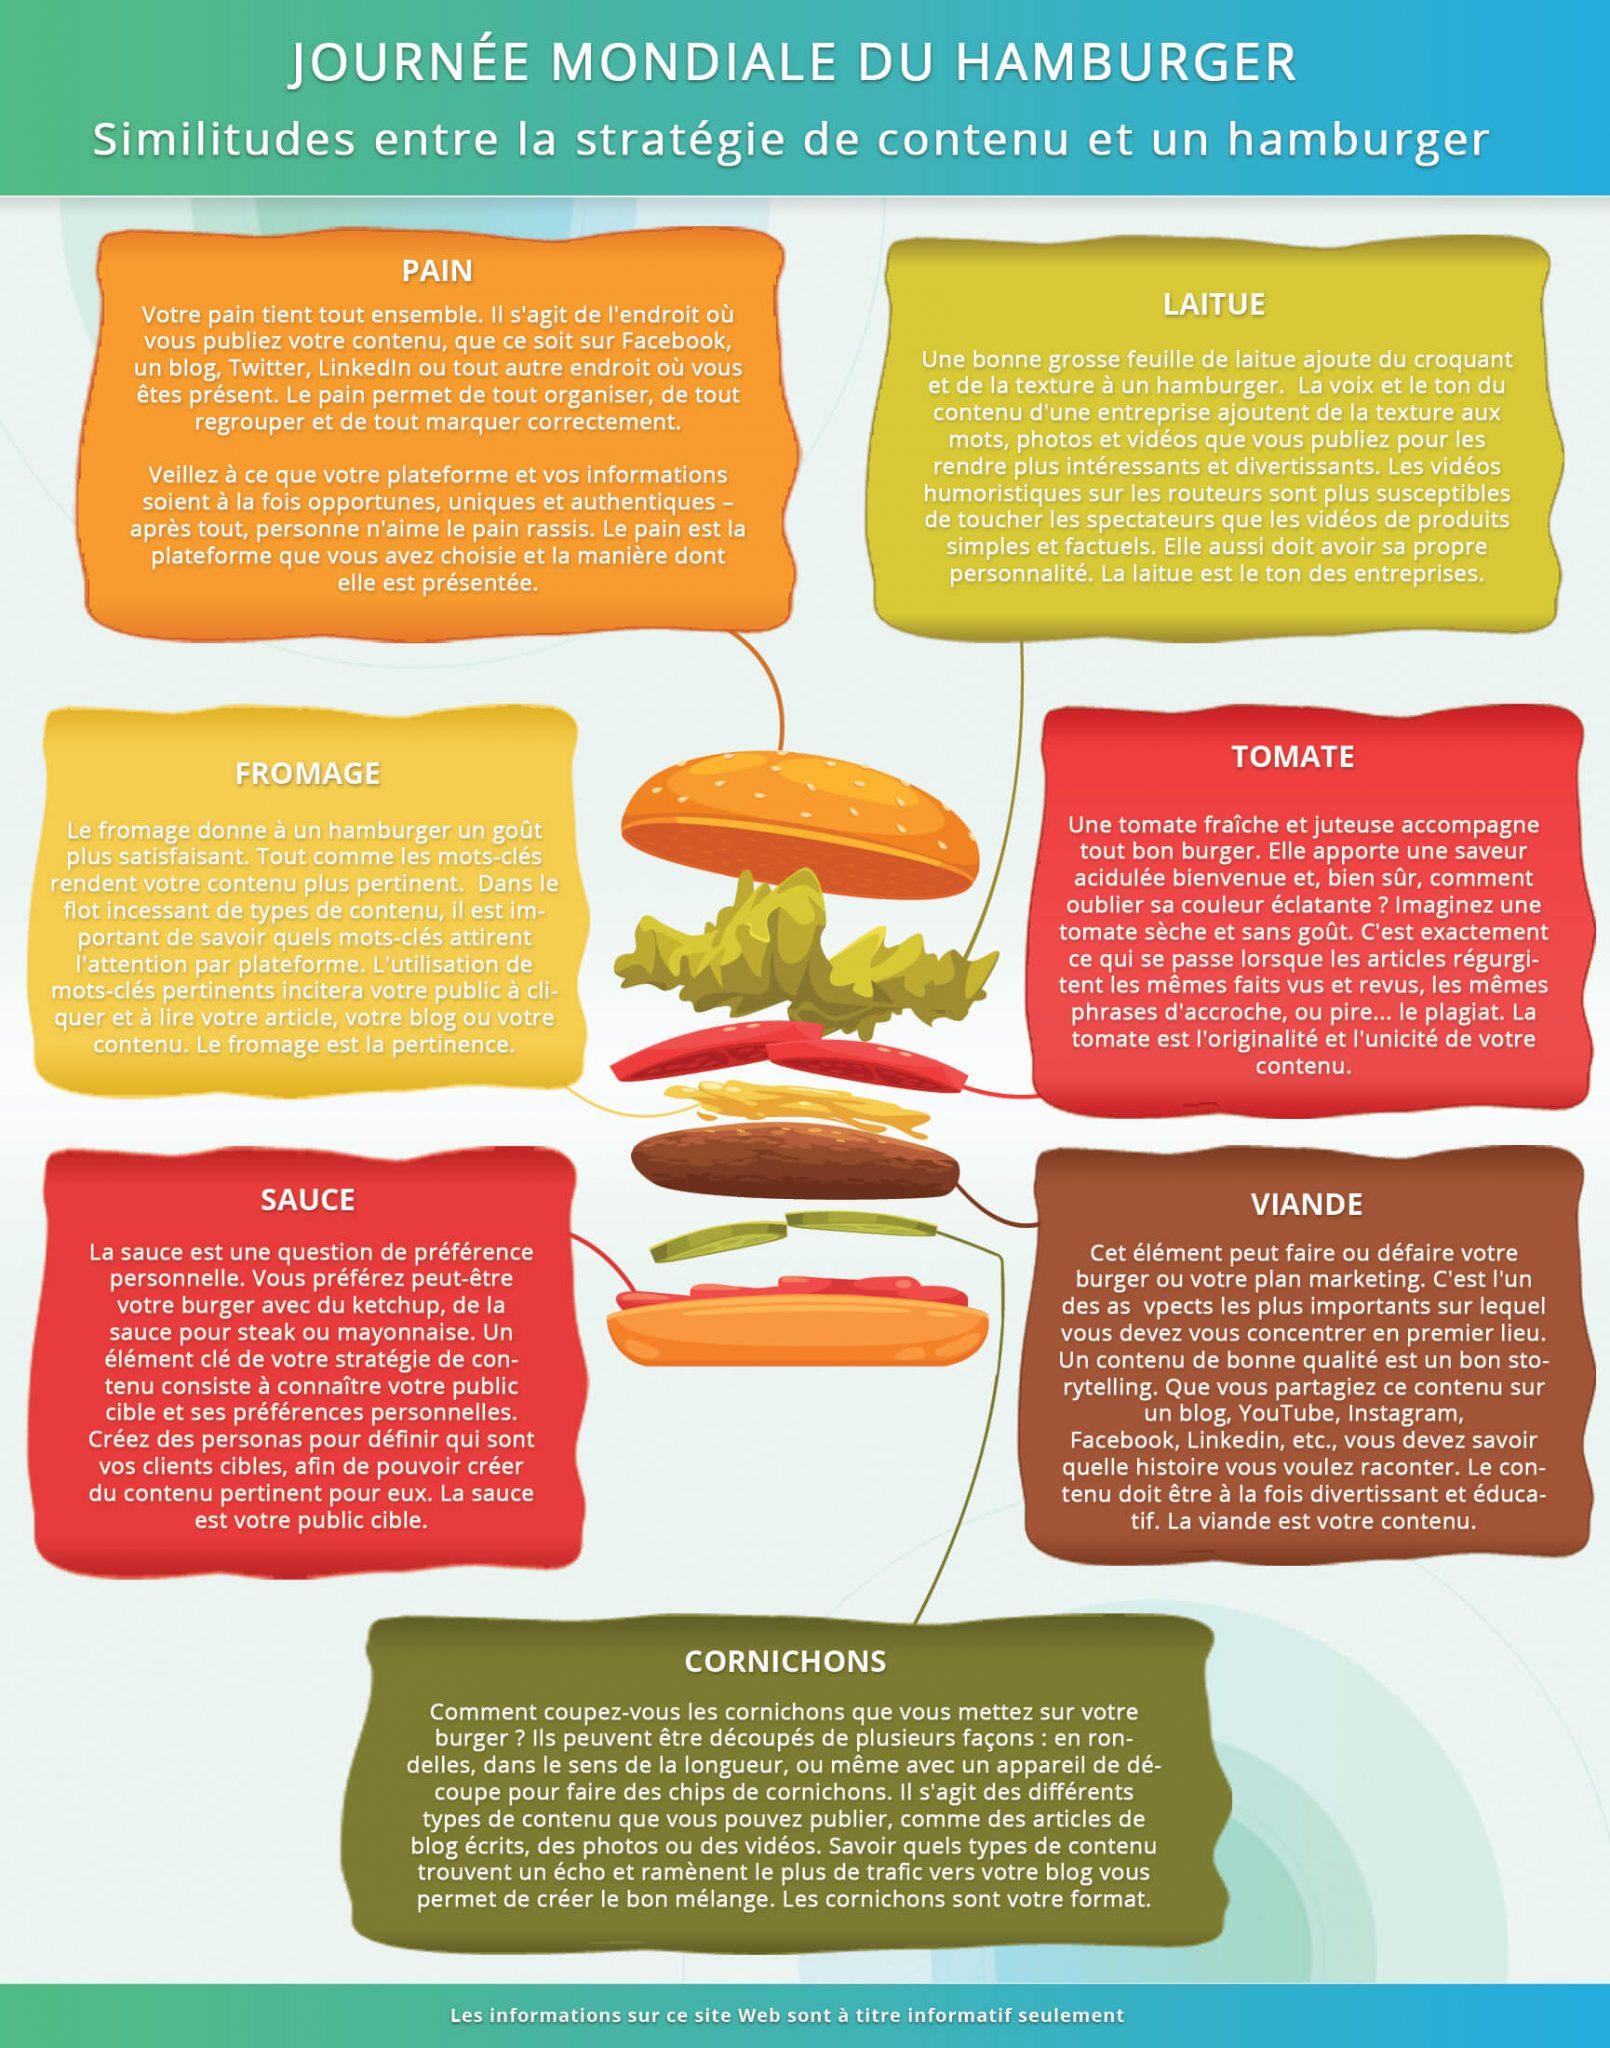 infographie-journee-mondiale-du-hamburger (1)